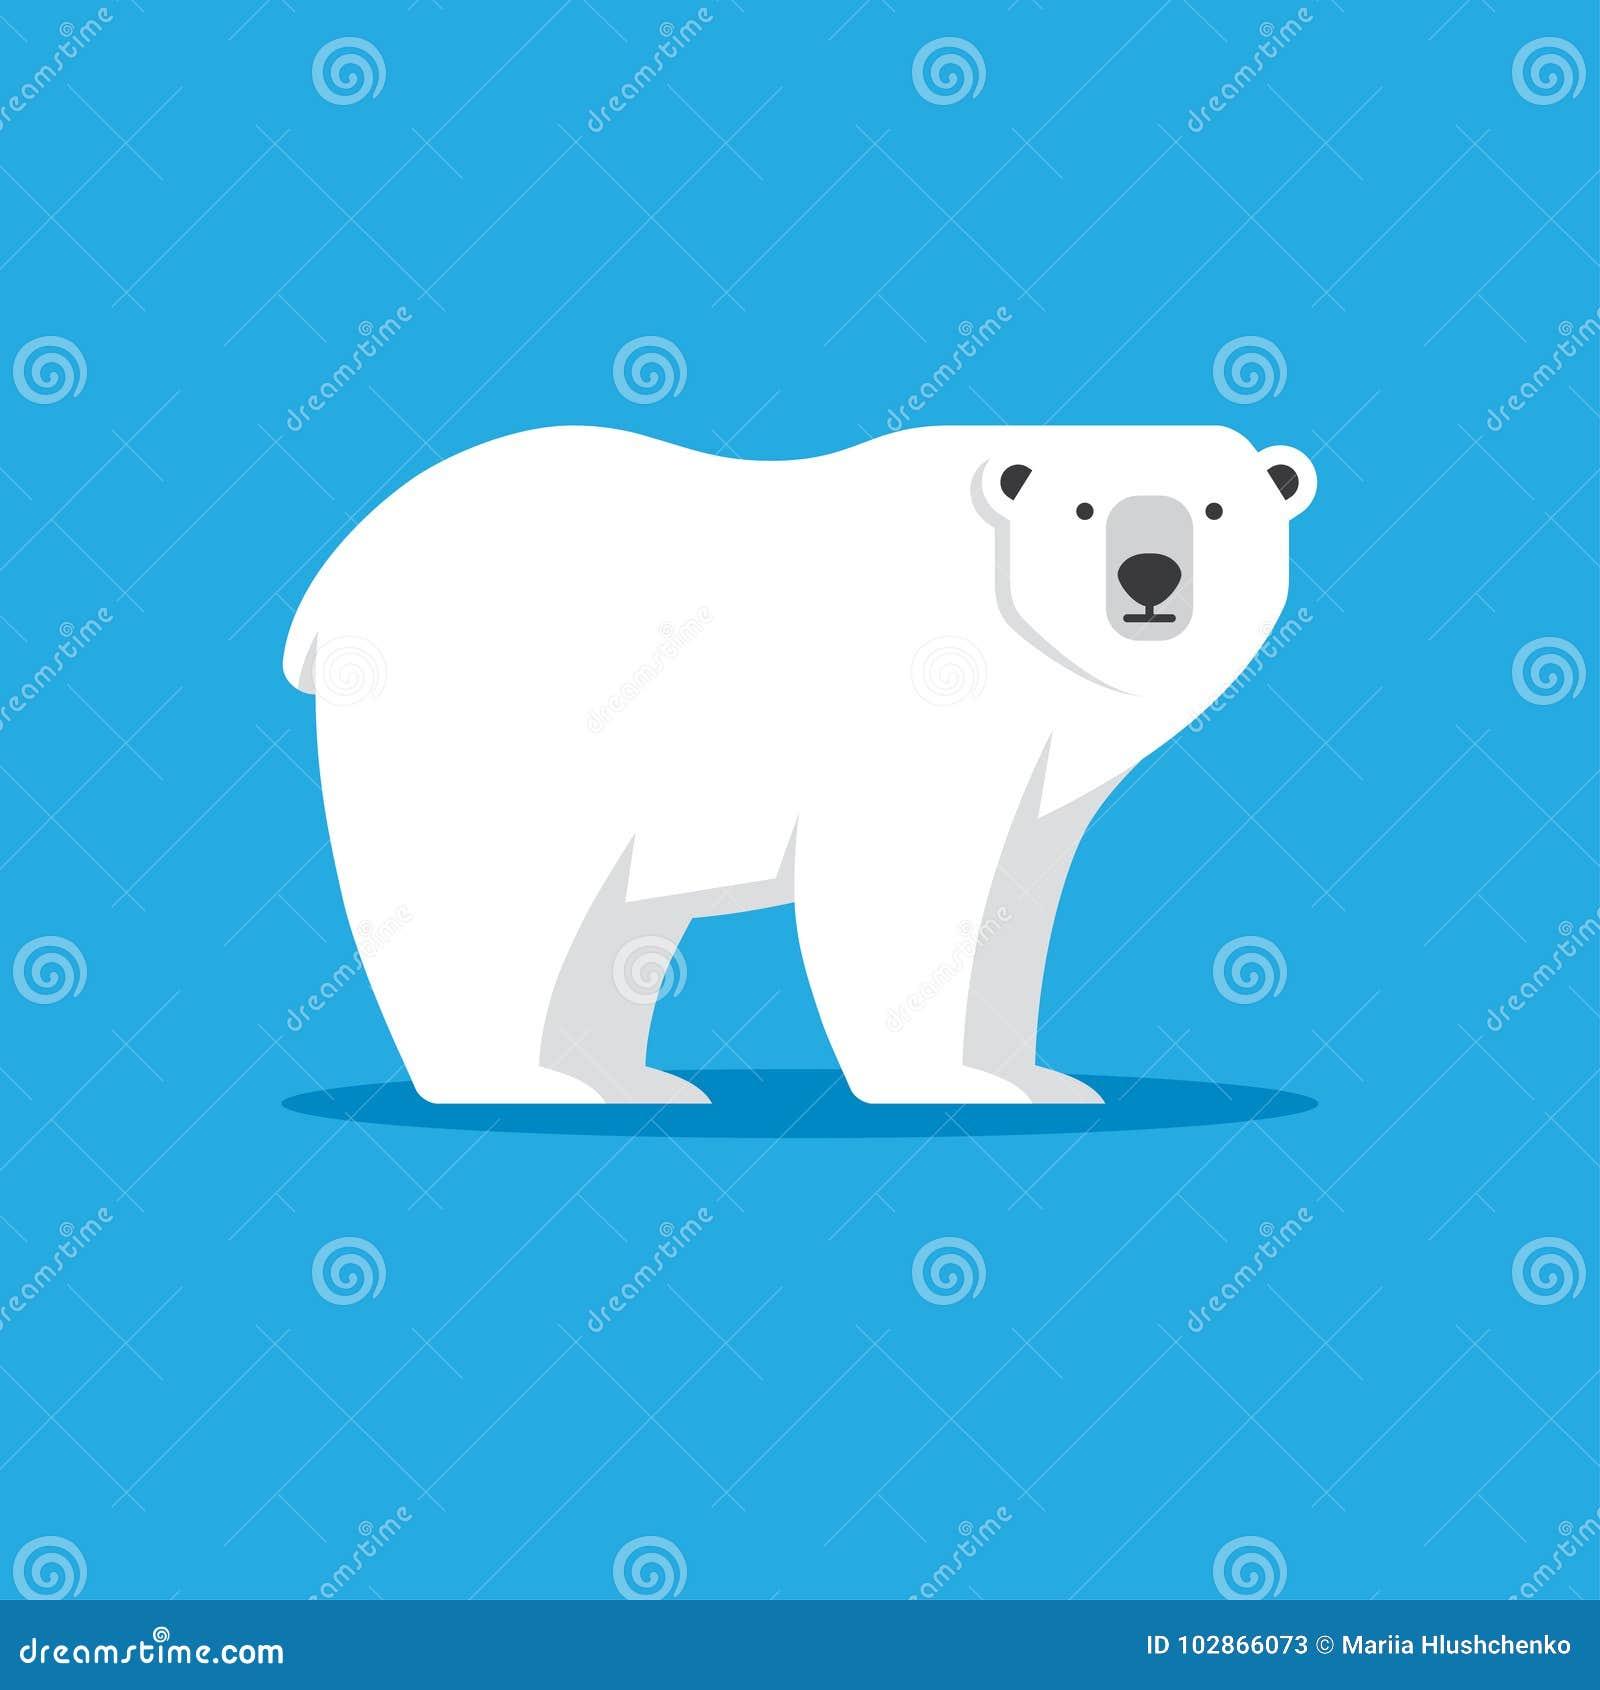 polar bear icon in flat style stock vector illustration. Black Bedroom Furniture Sets. Home Design Ideas